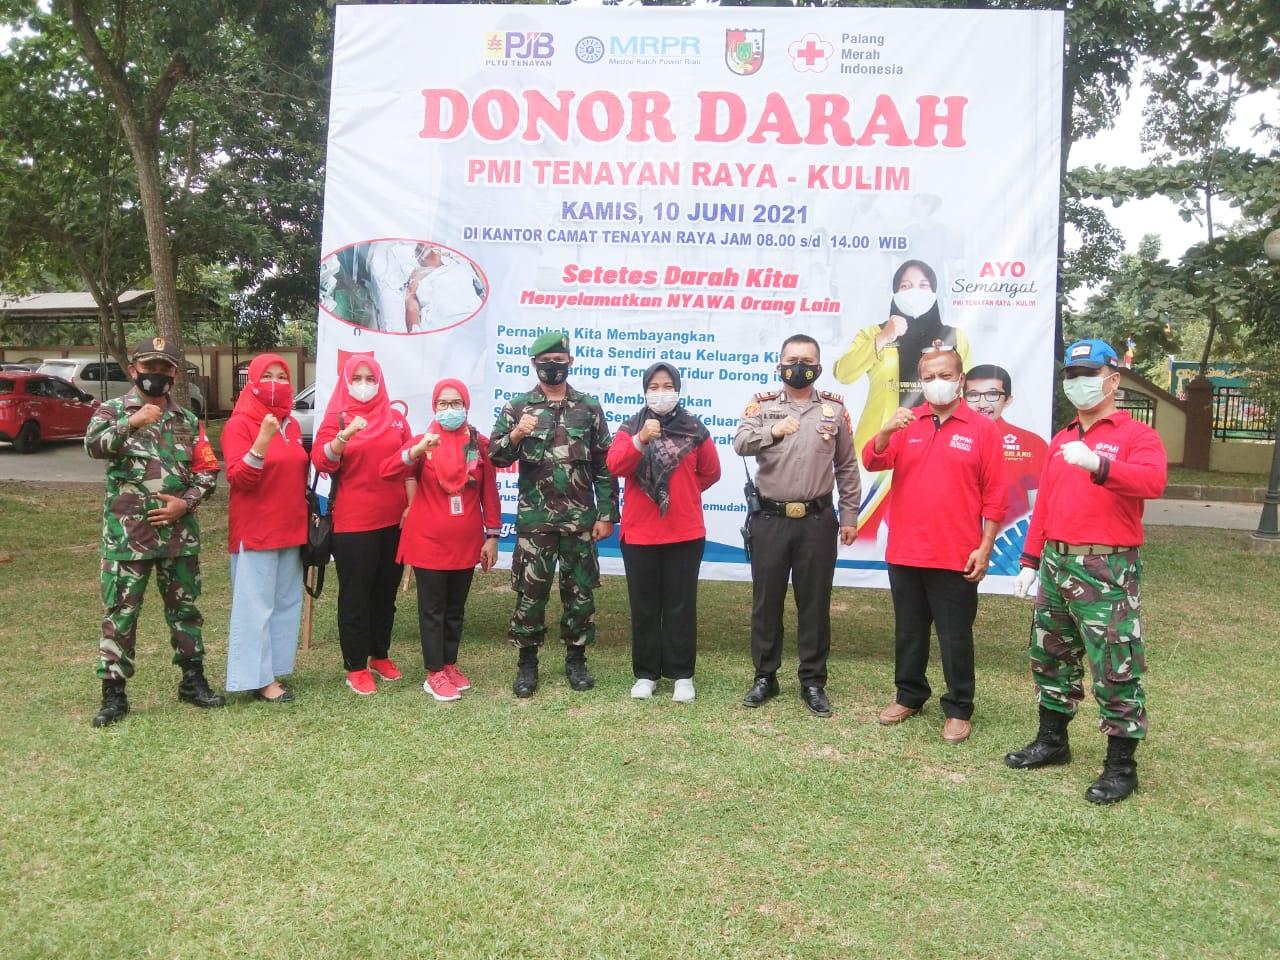 Image : Donor Darah di Tenayan Raya Terkumpul 115 Kantong Darah